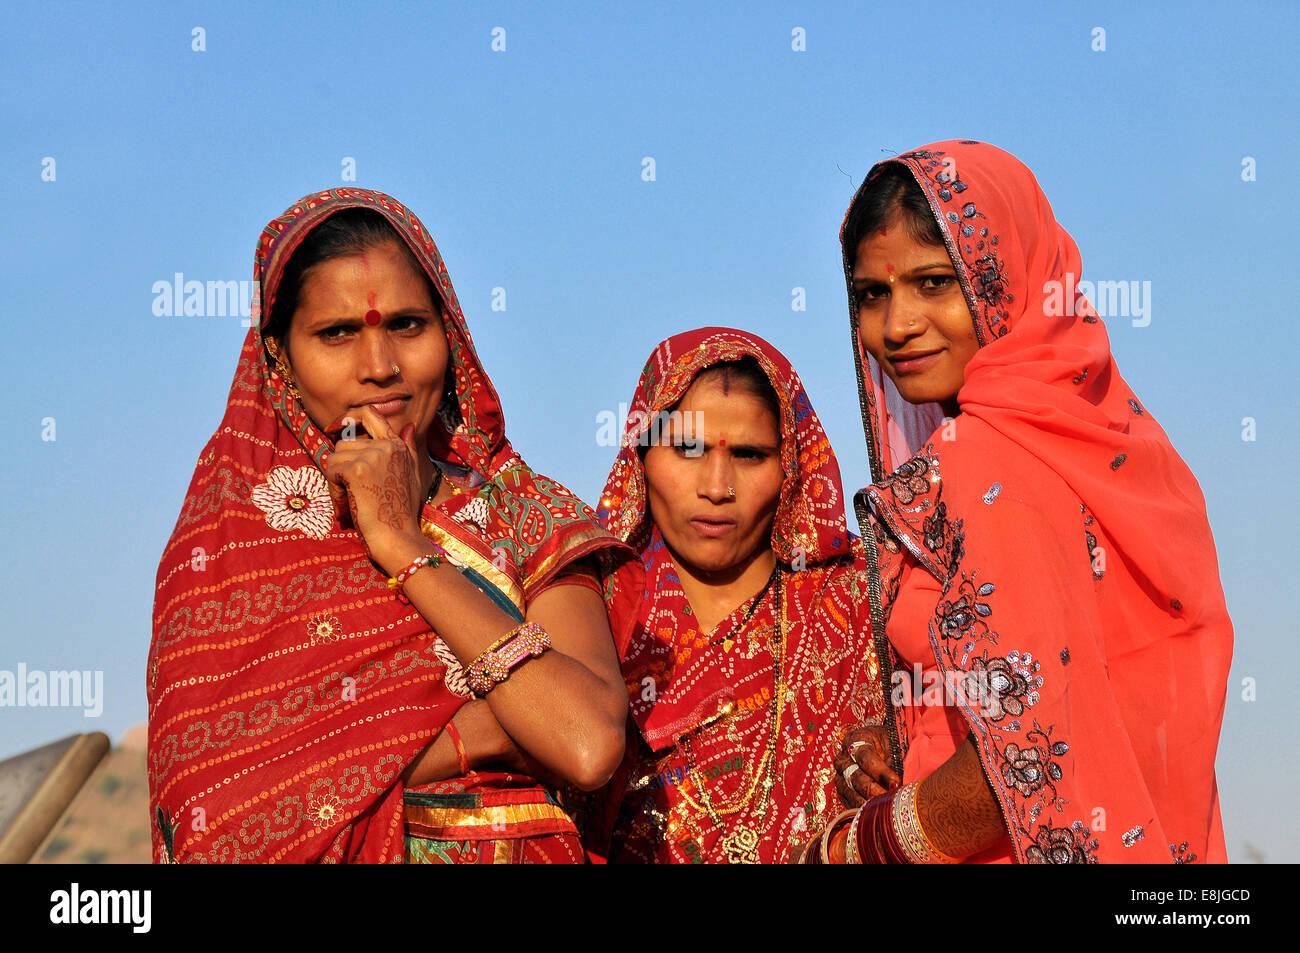 Rajasthani women. Stock Photo